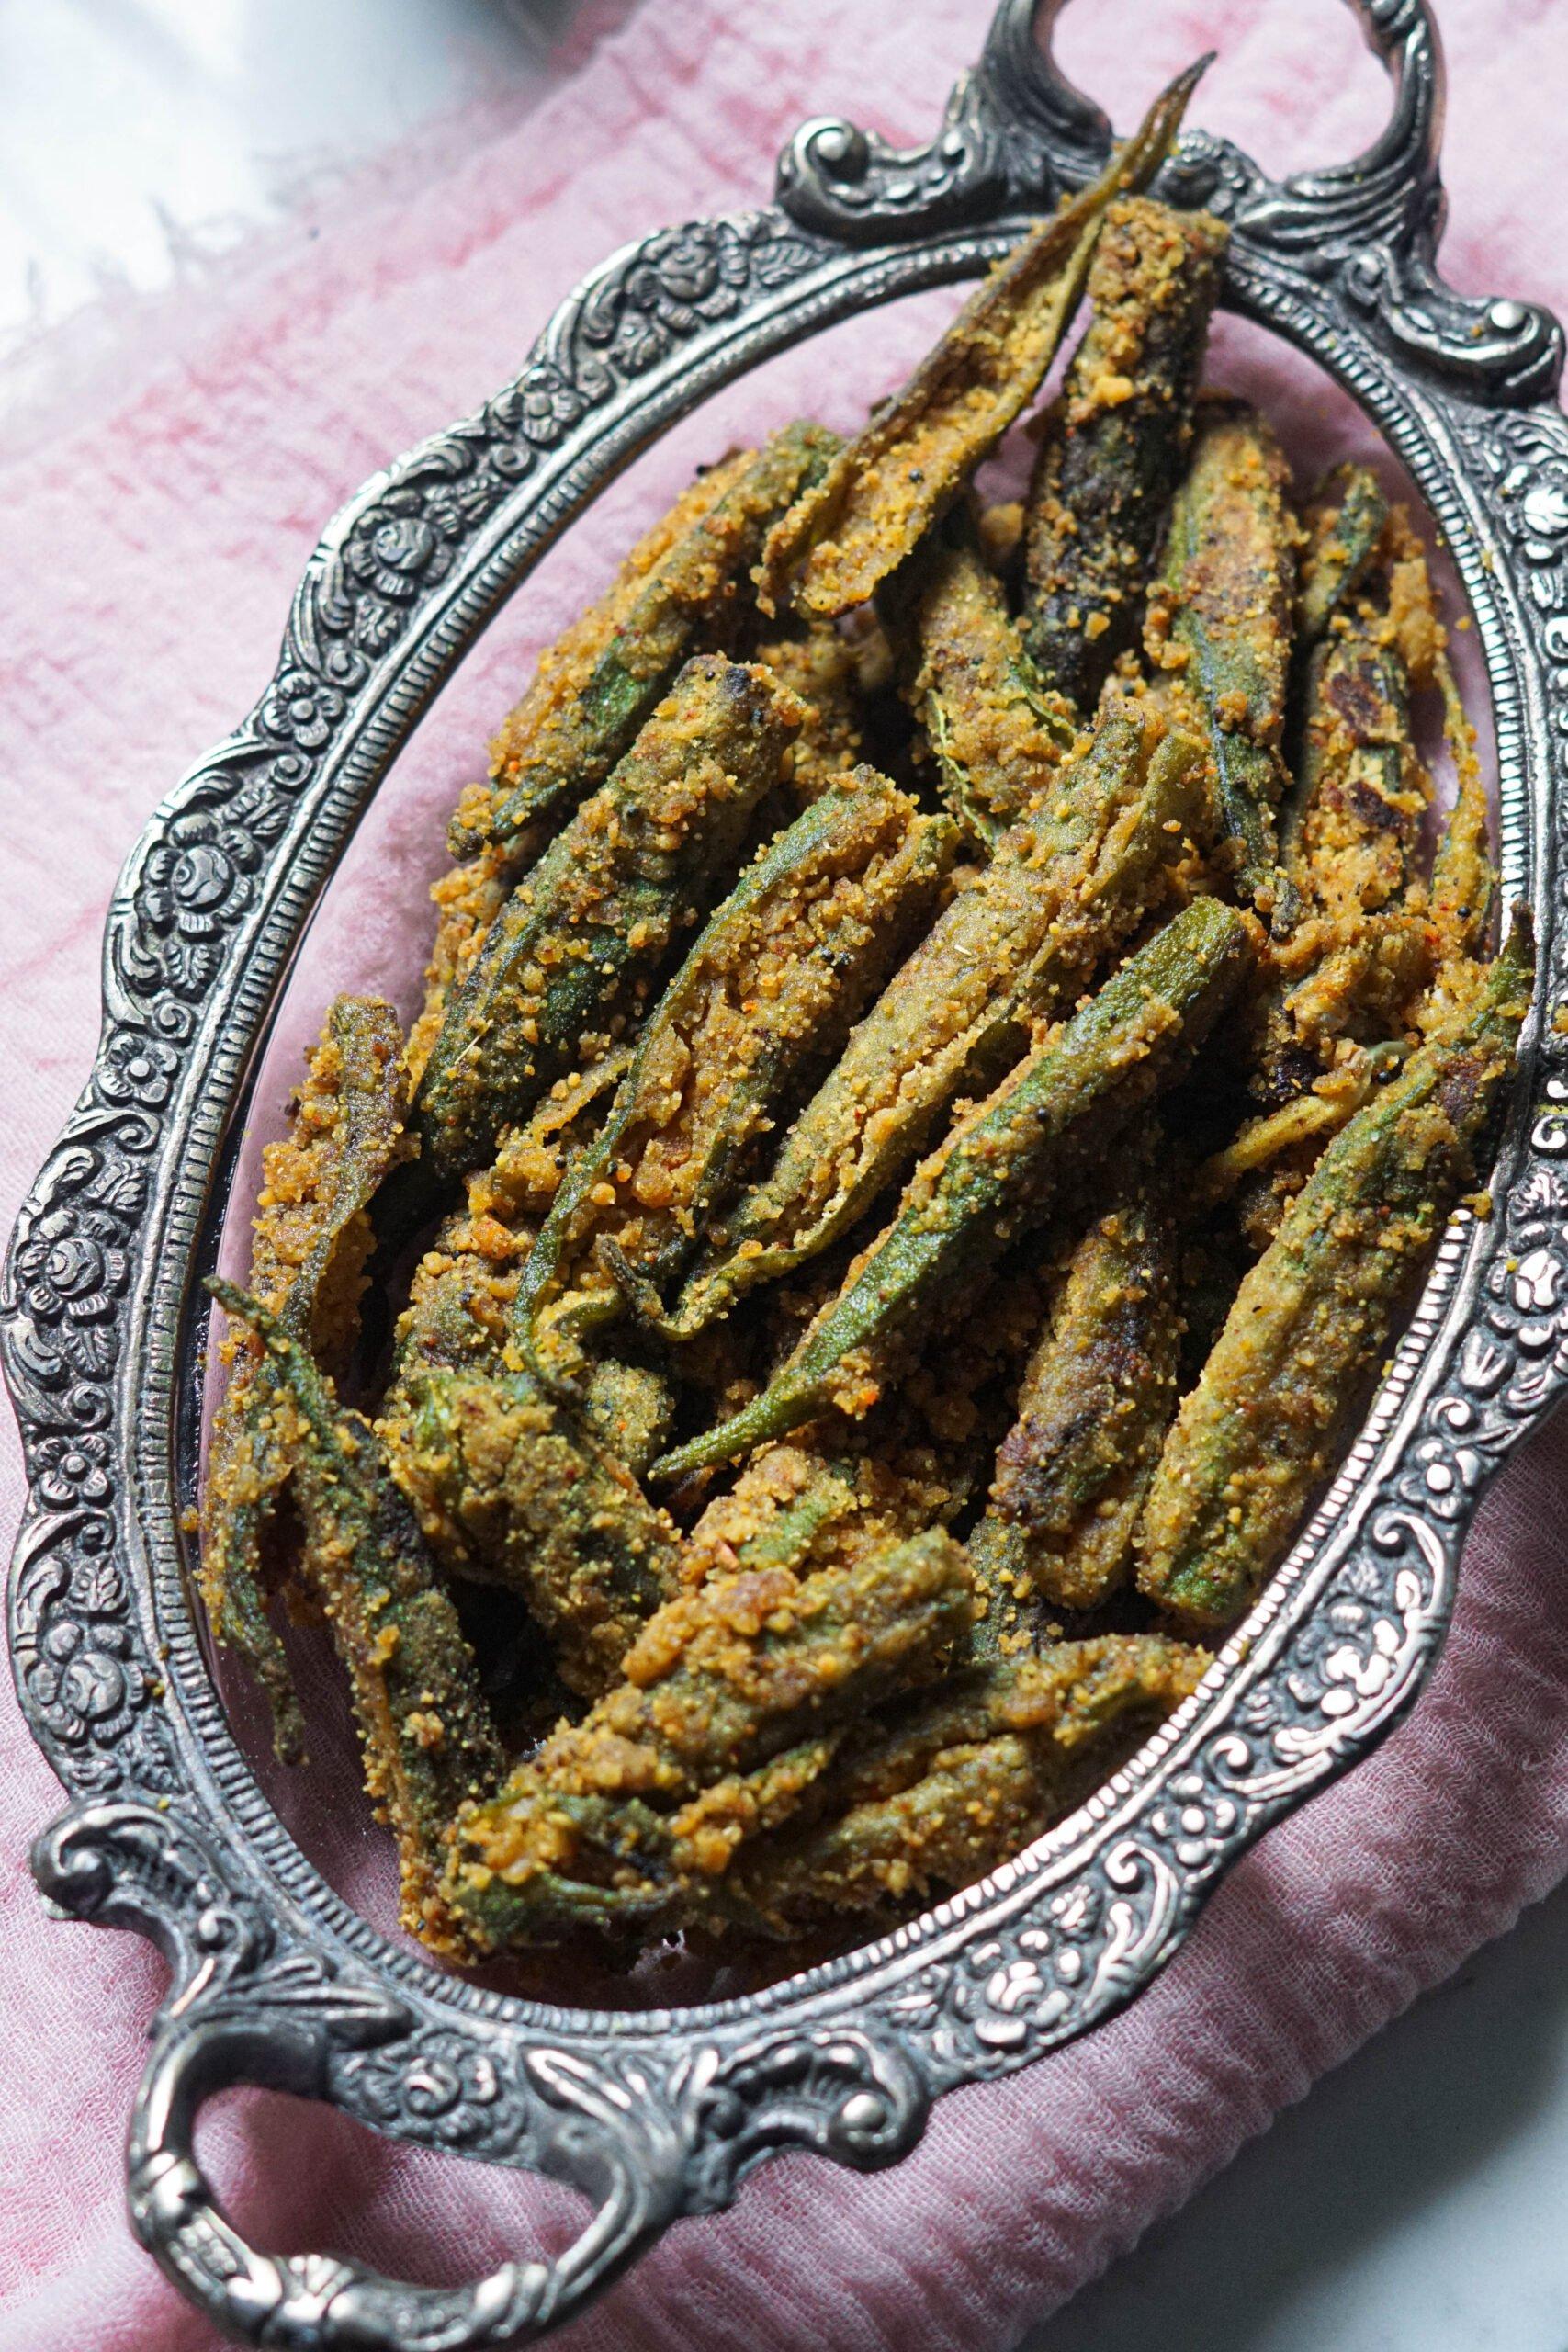 Bharwa bhindi in a ornate platter